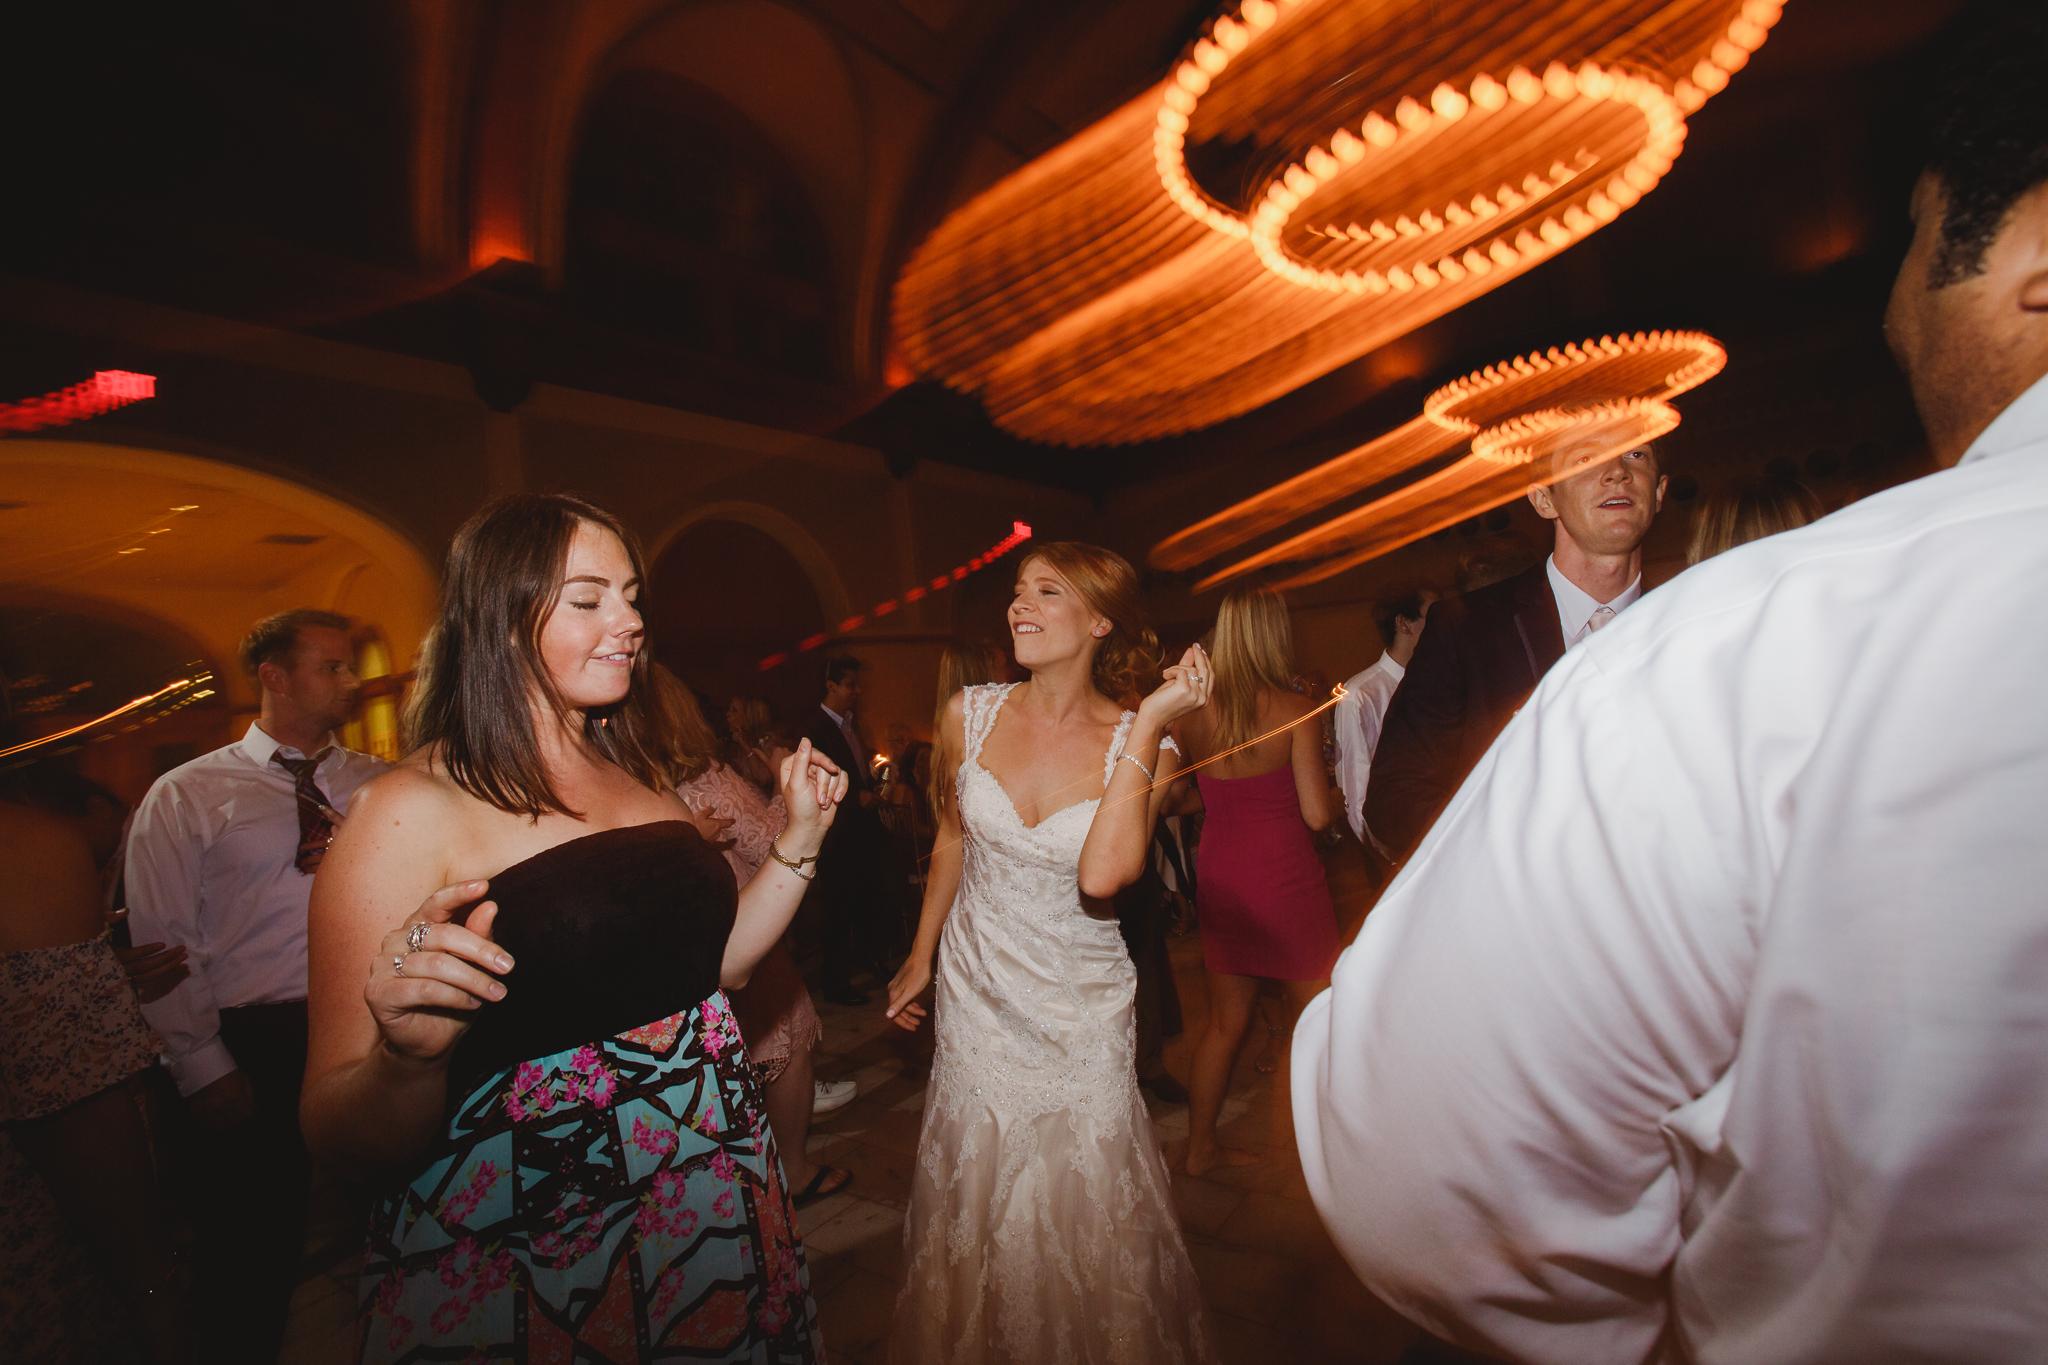 Michael and Kelly - the ashton depot - wedding DFW - wedding photographer- elizalde photography (128 of 150).jpg